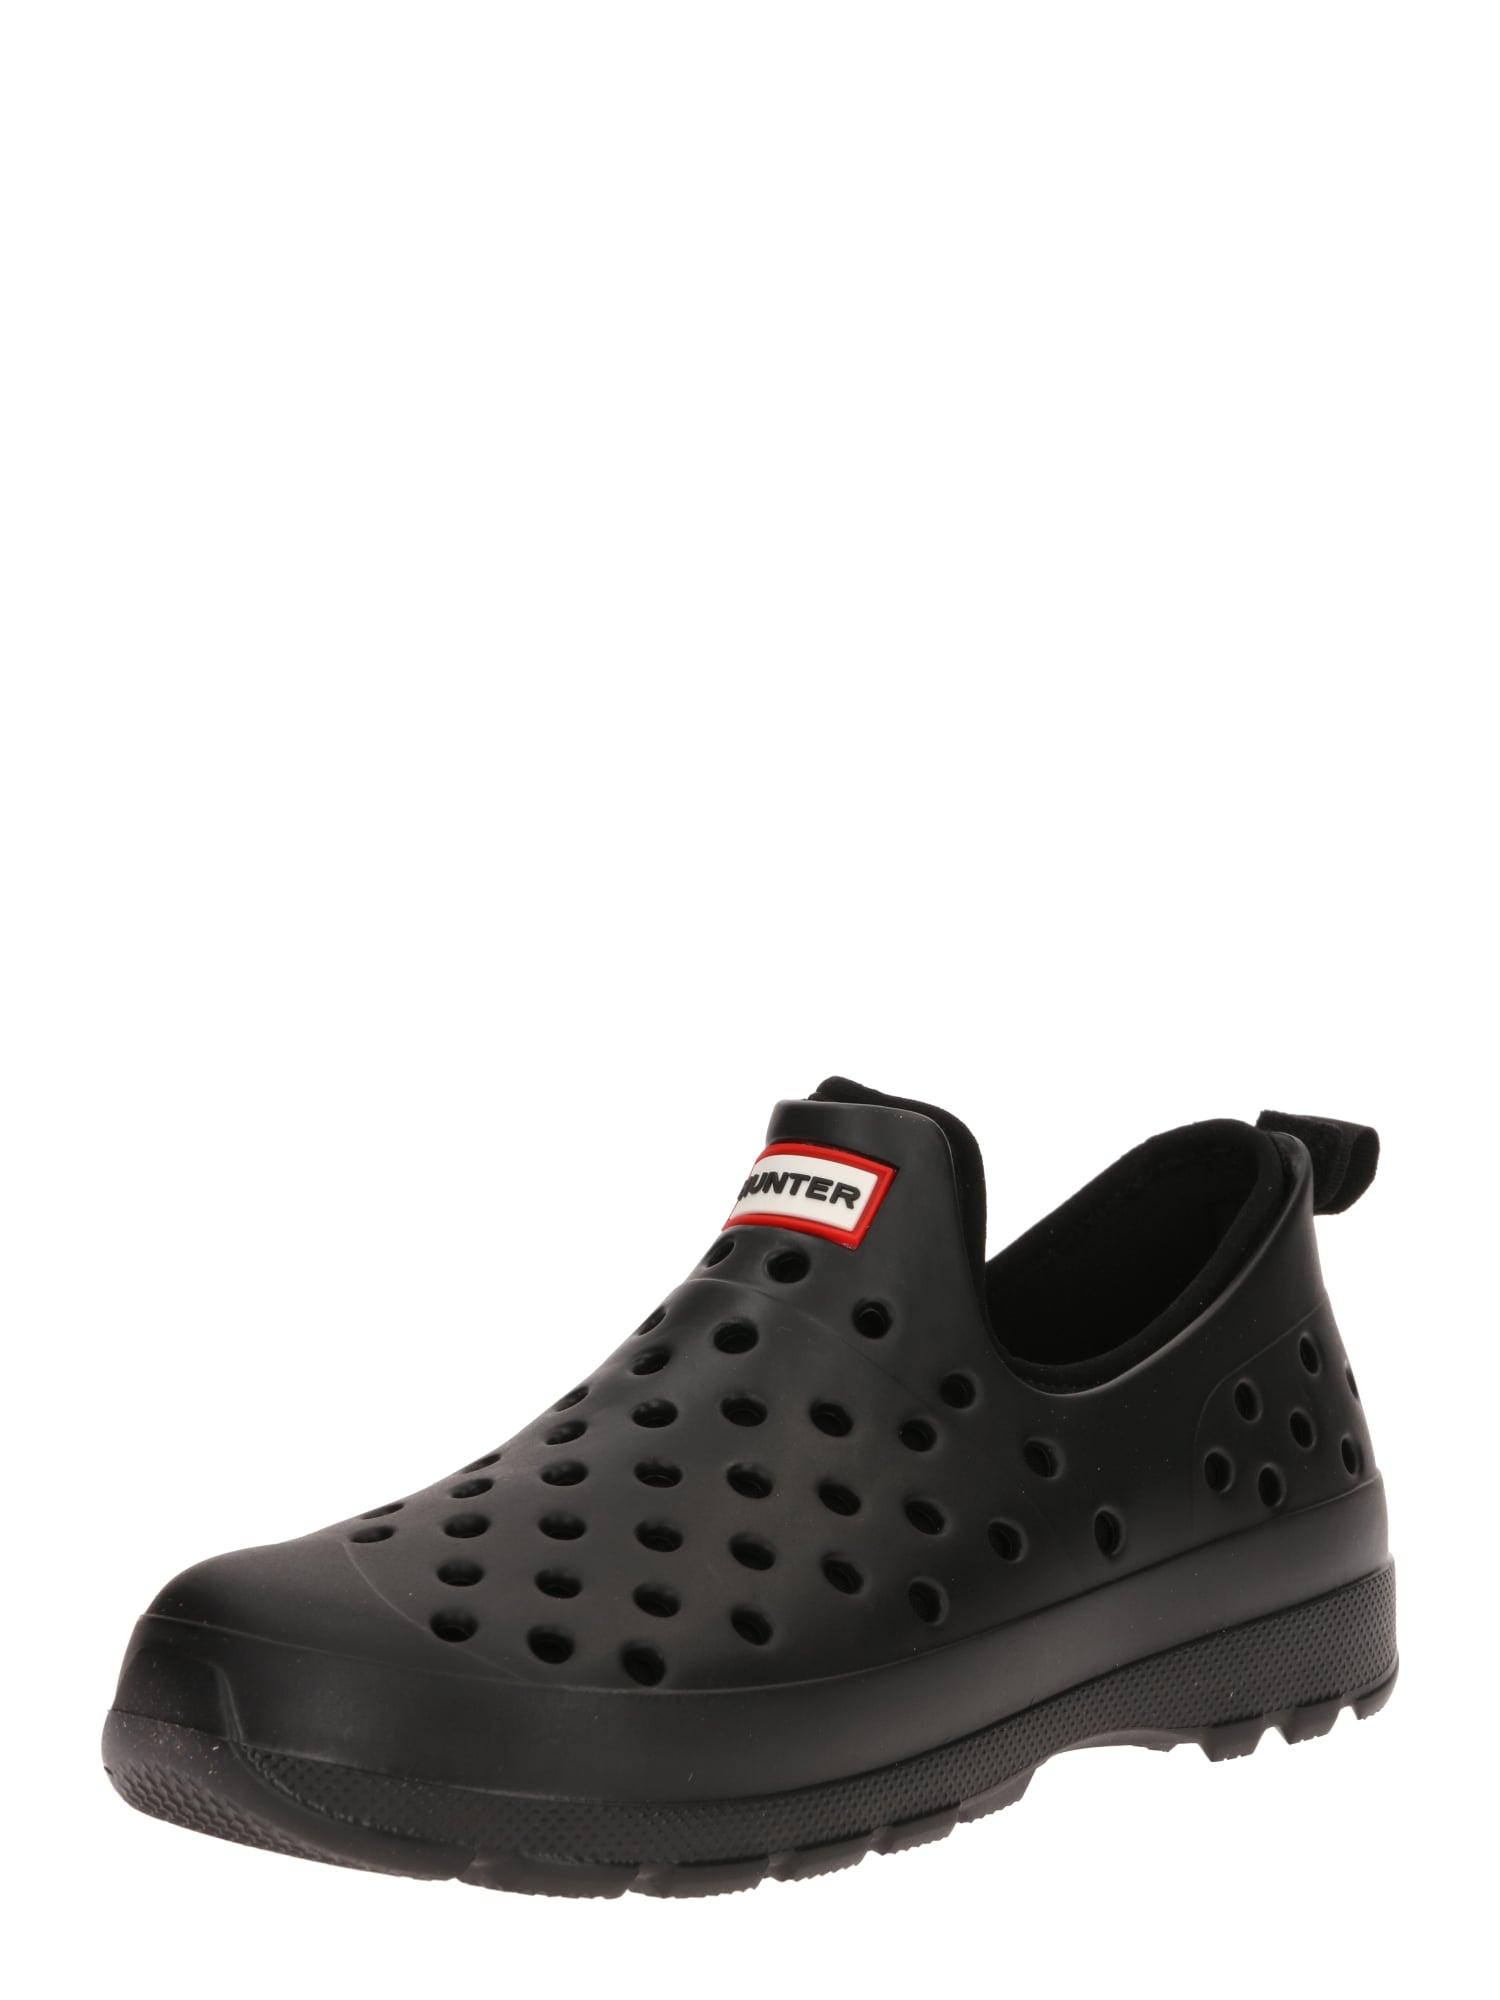 HUNTER Guminiai batai juoda / raudona / balta